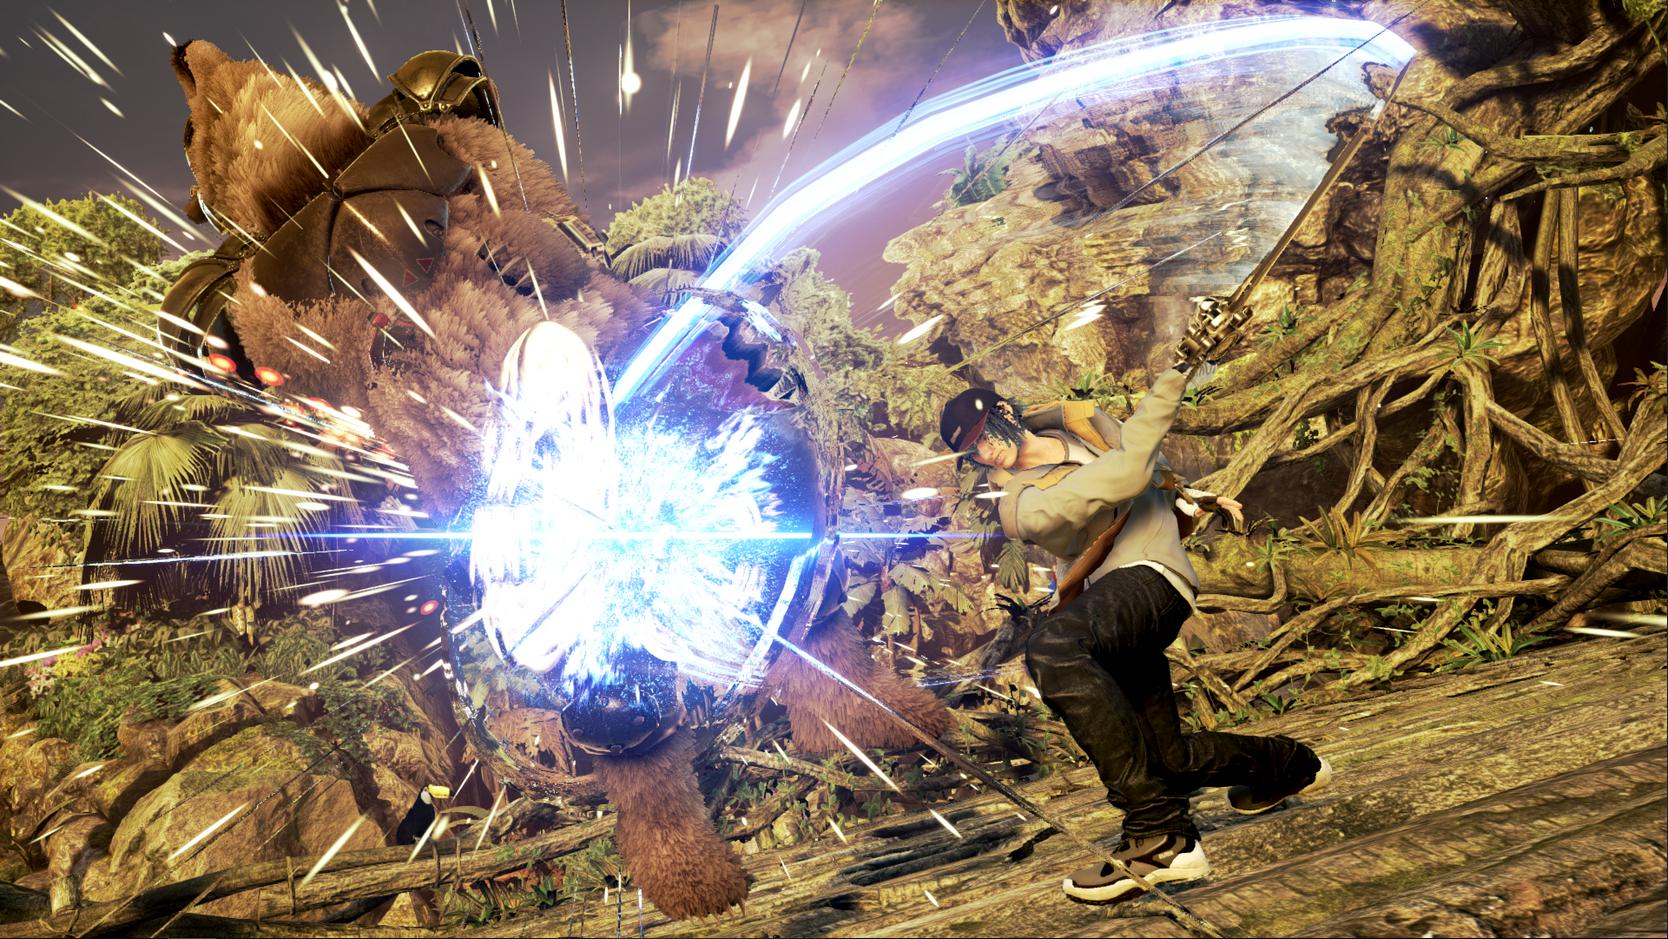 Noctis Joins Tekken 7 On March 20th New Gameplay Trailer